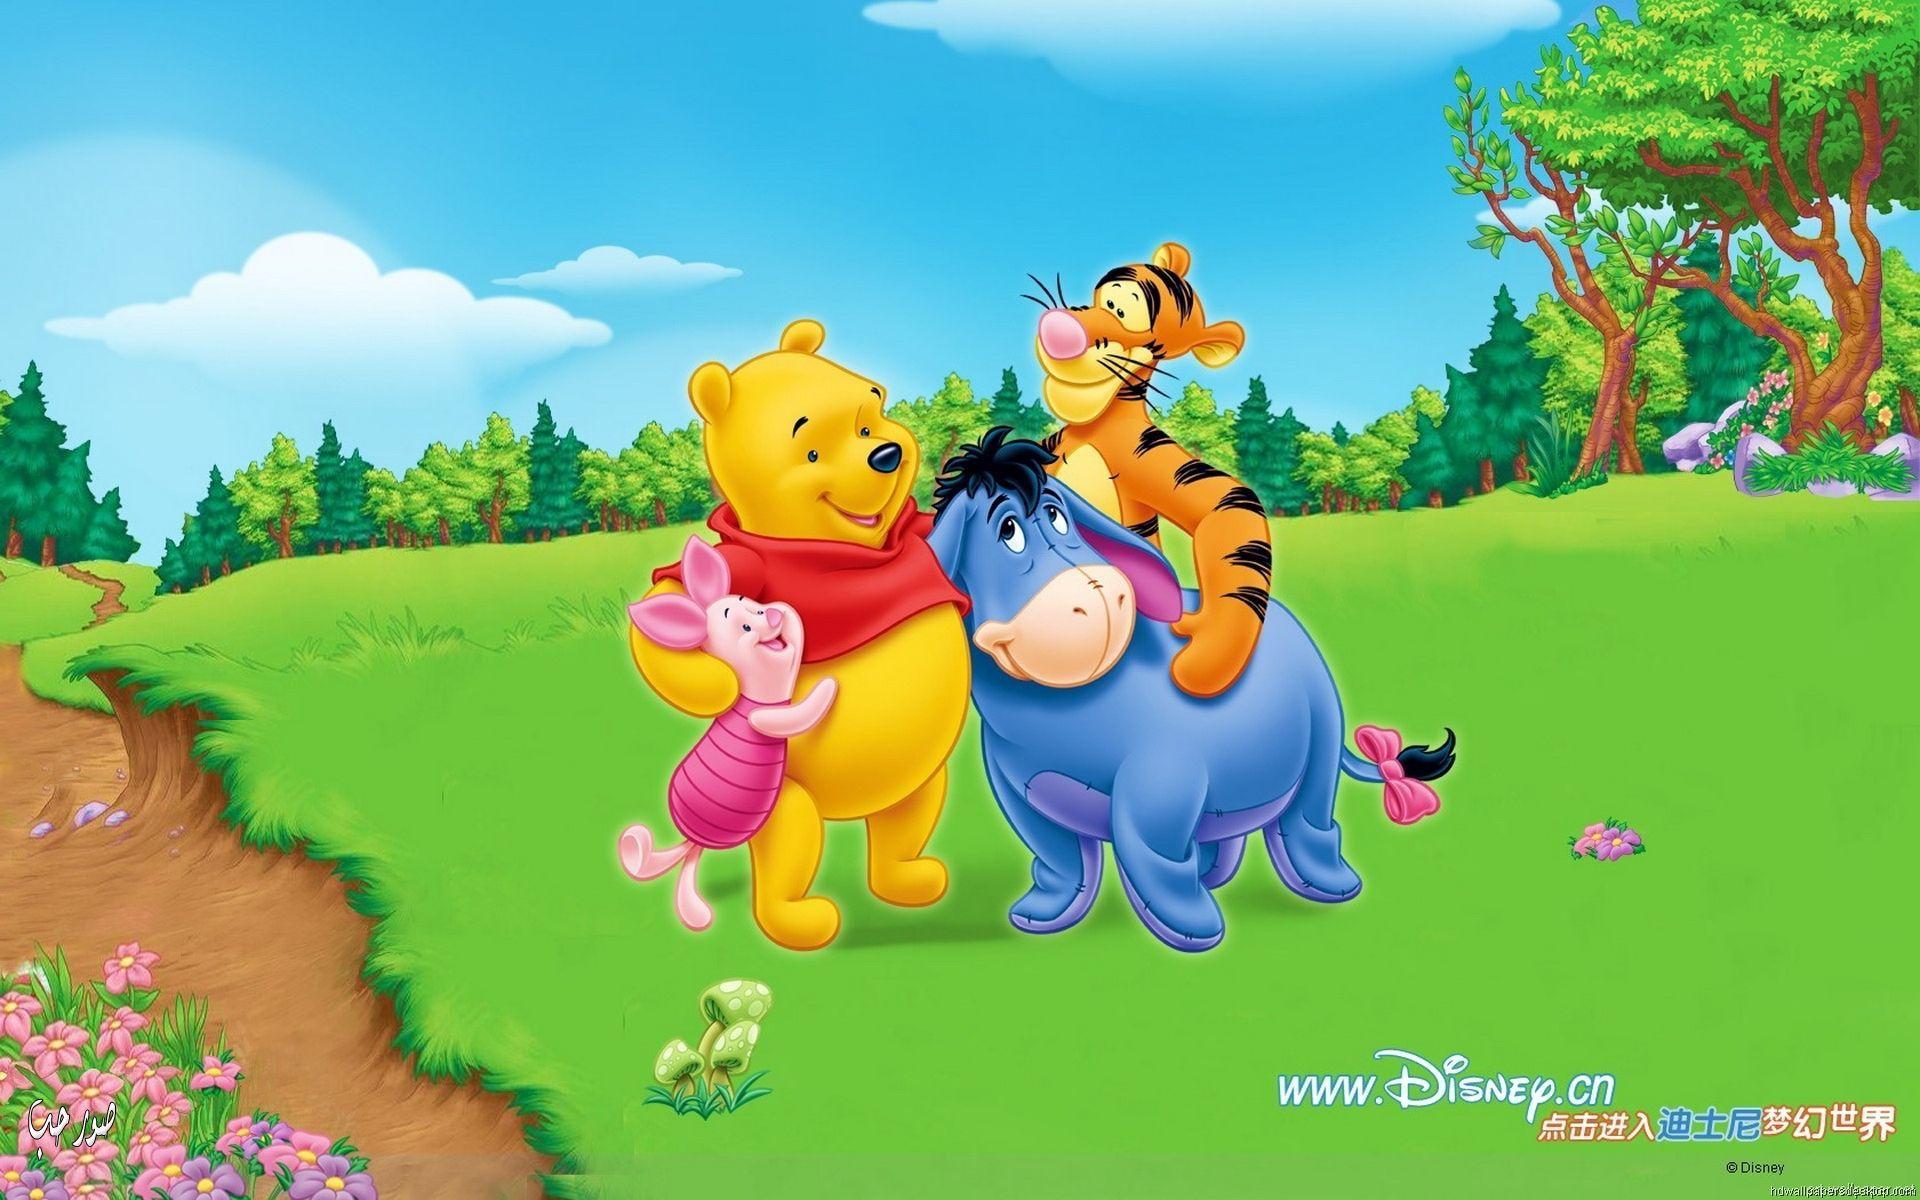 صور جميلة جدا للاطفال كرتون بووه بالصور Pooh Wallpapers Winnie The Pooh Pictures Winnie The Pooh Cute Winnie The Pooh